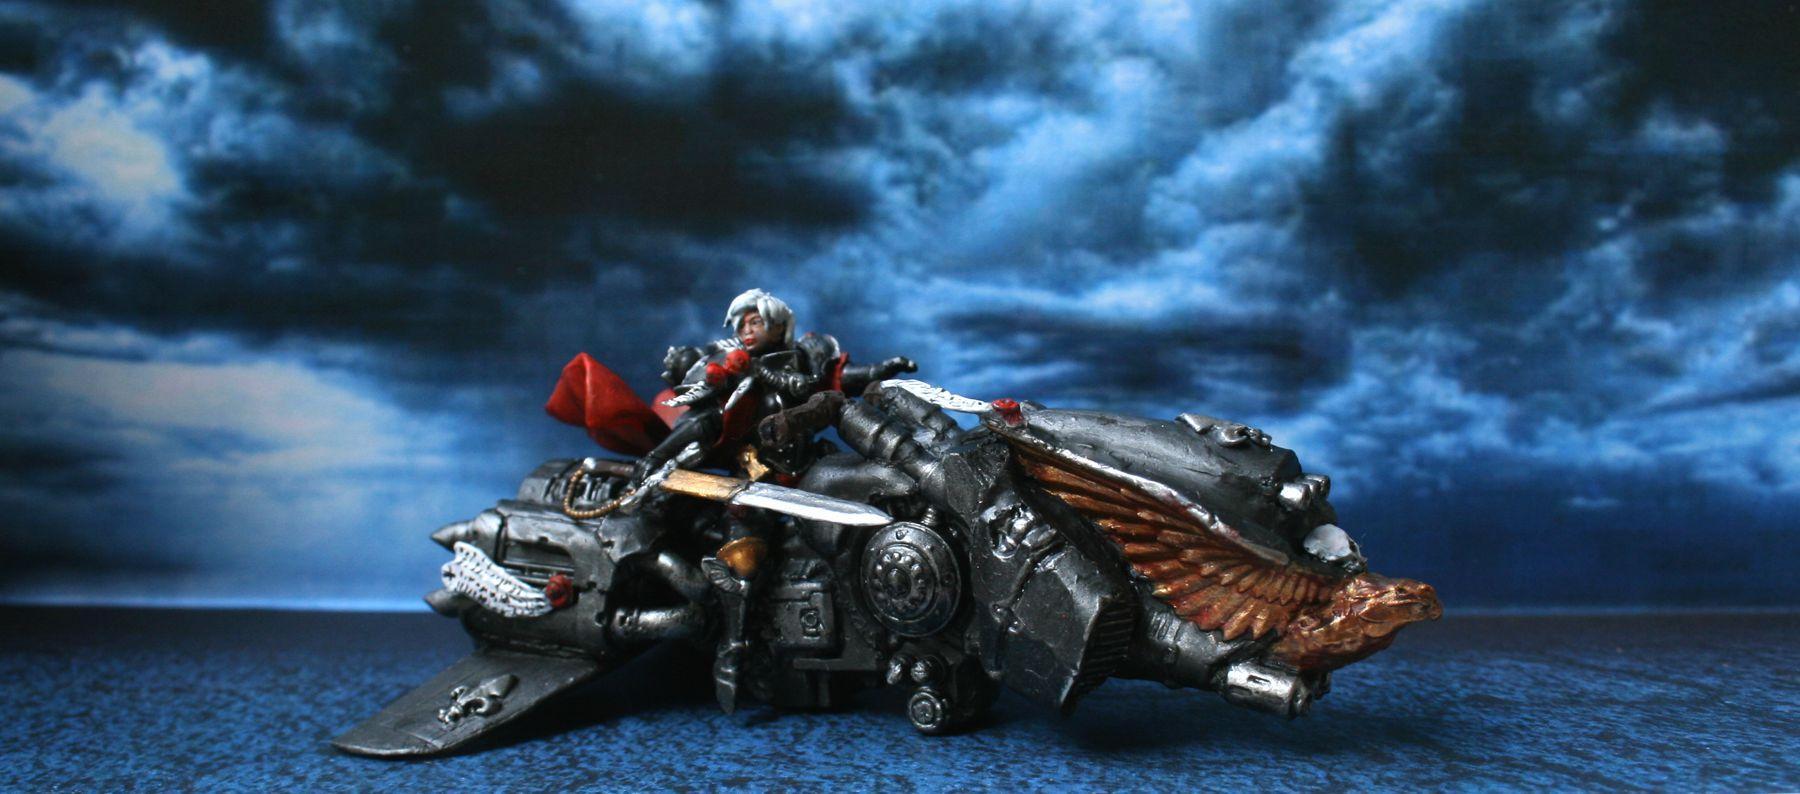 Adepta Sororitas, Dawneagle, Inquisition, Jetbike, Sisters Of Battle